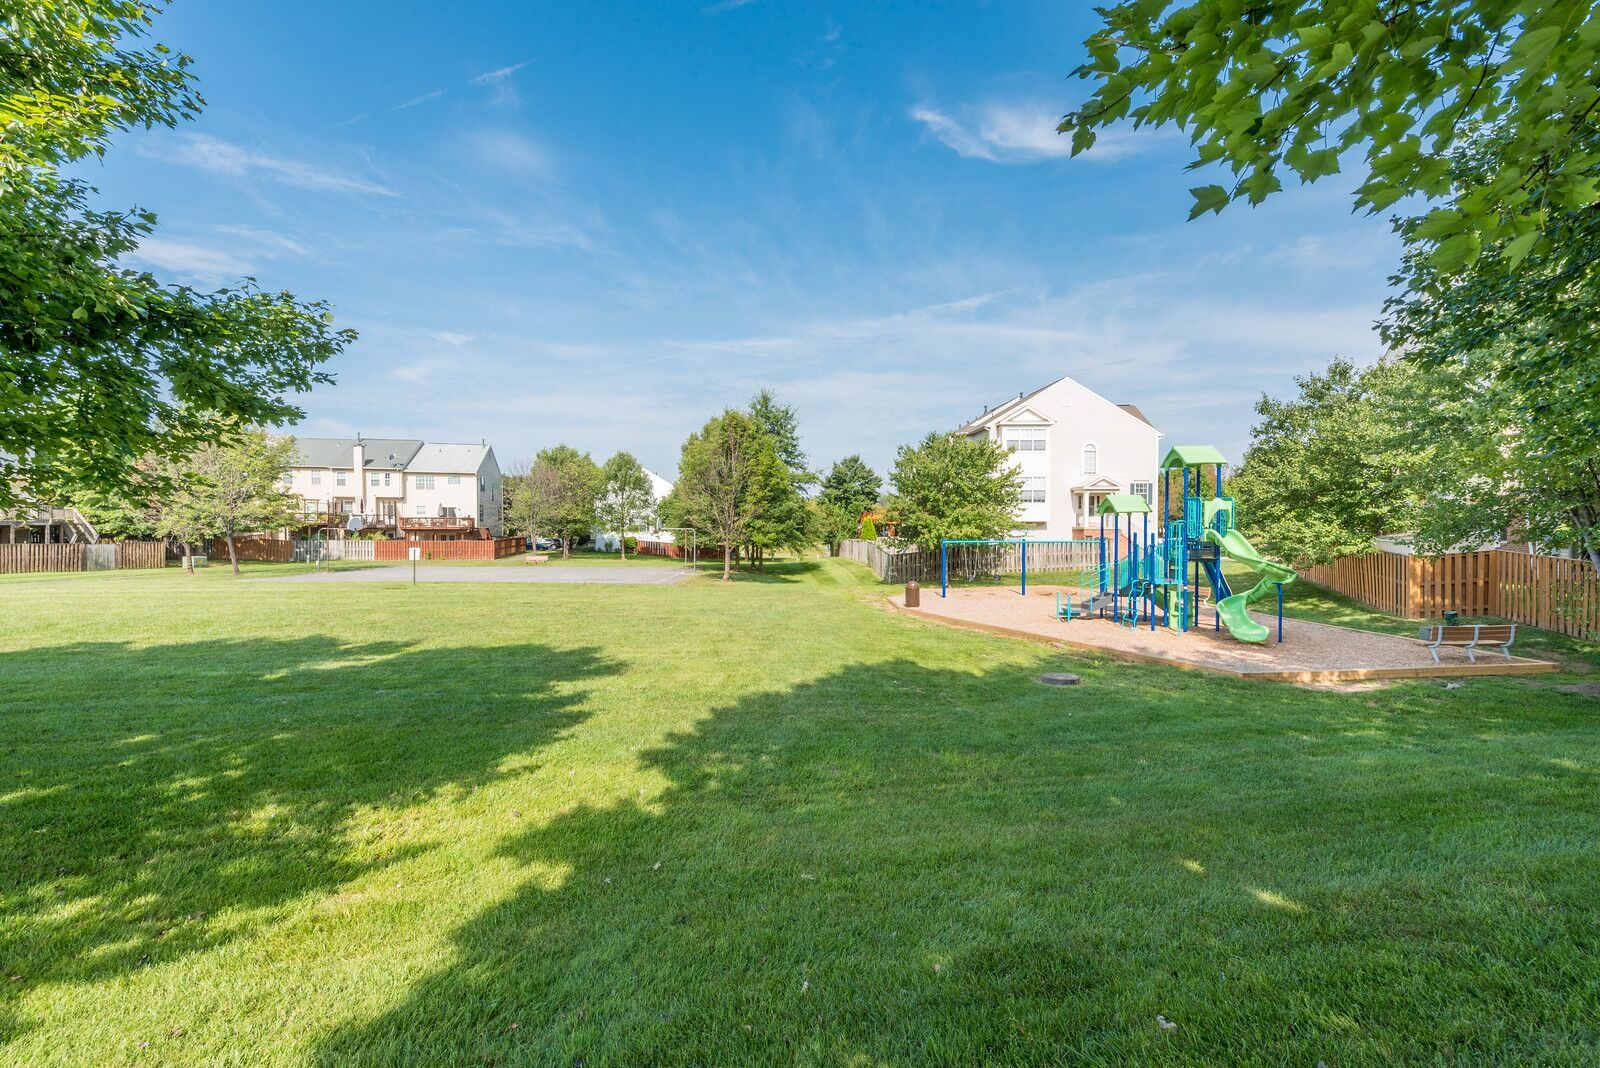 Playground at Carisbrooke HOA